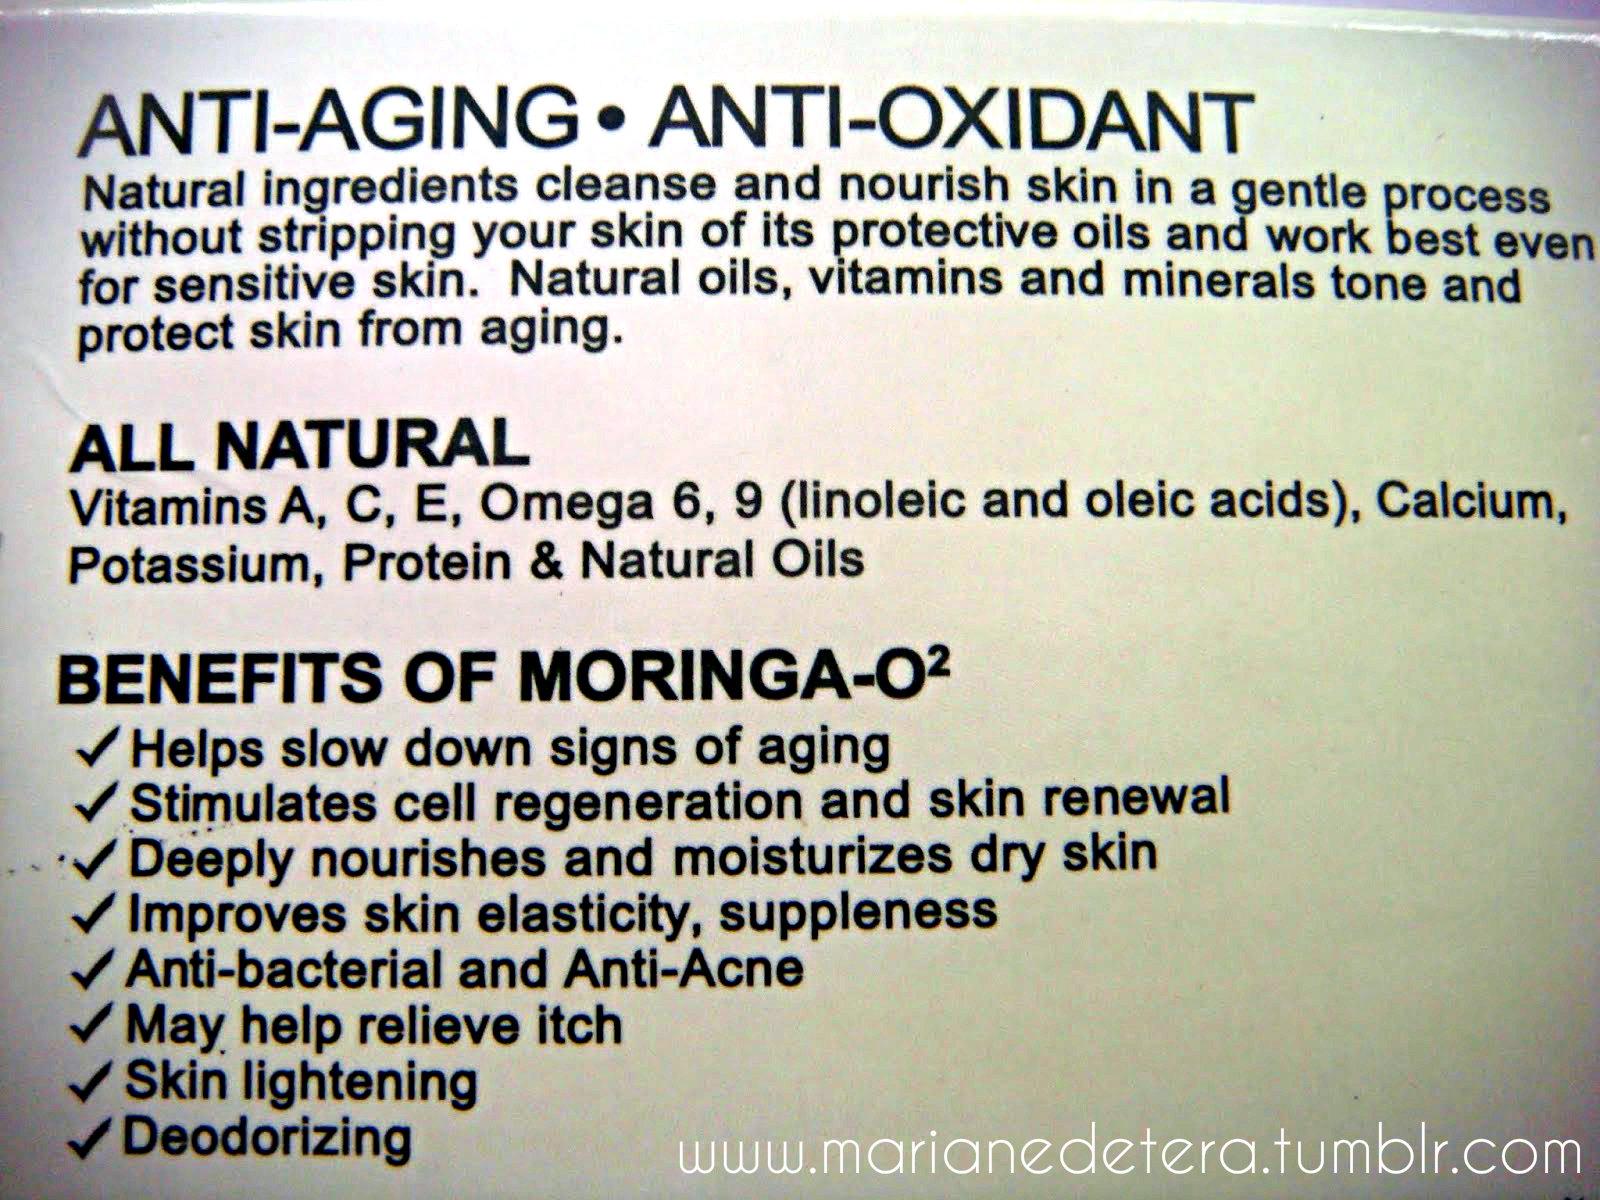 Moringa Oil Skin Benefits images